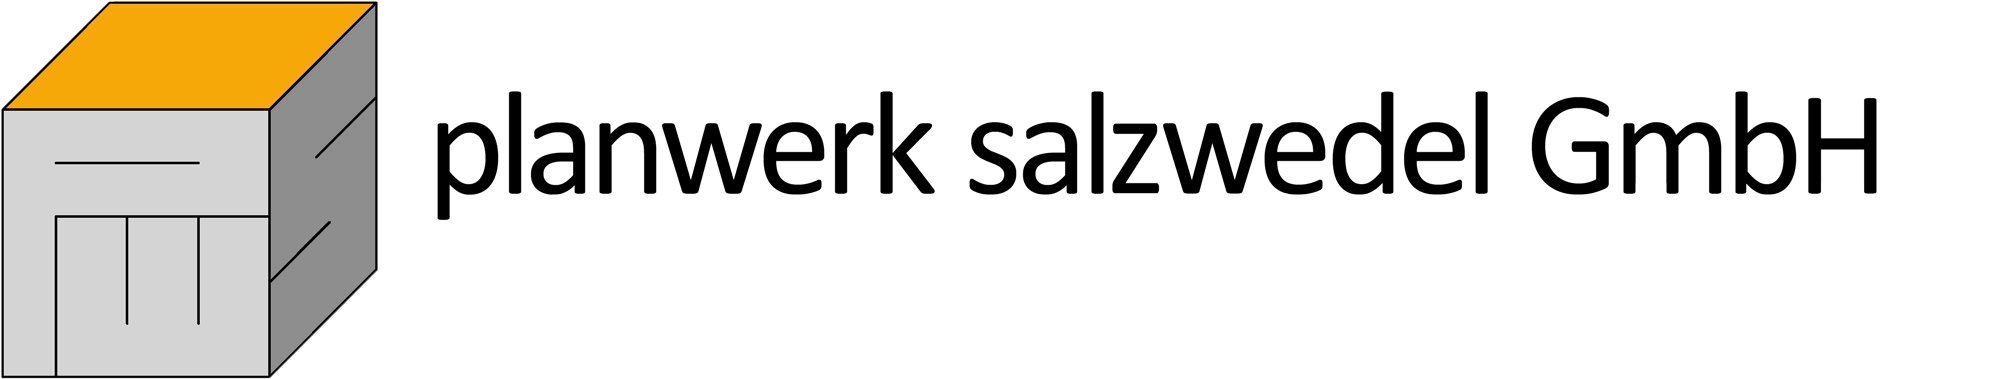 planwerk salzwedel GmbH